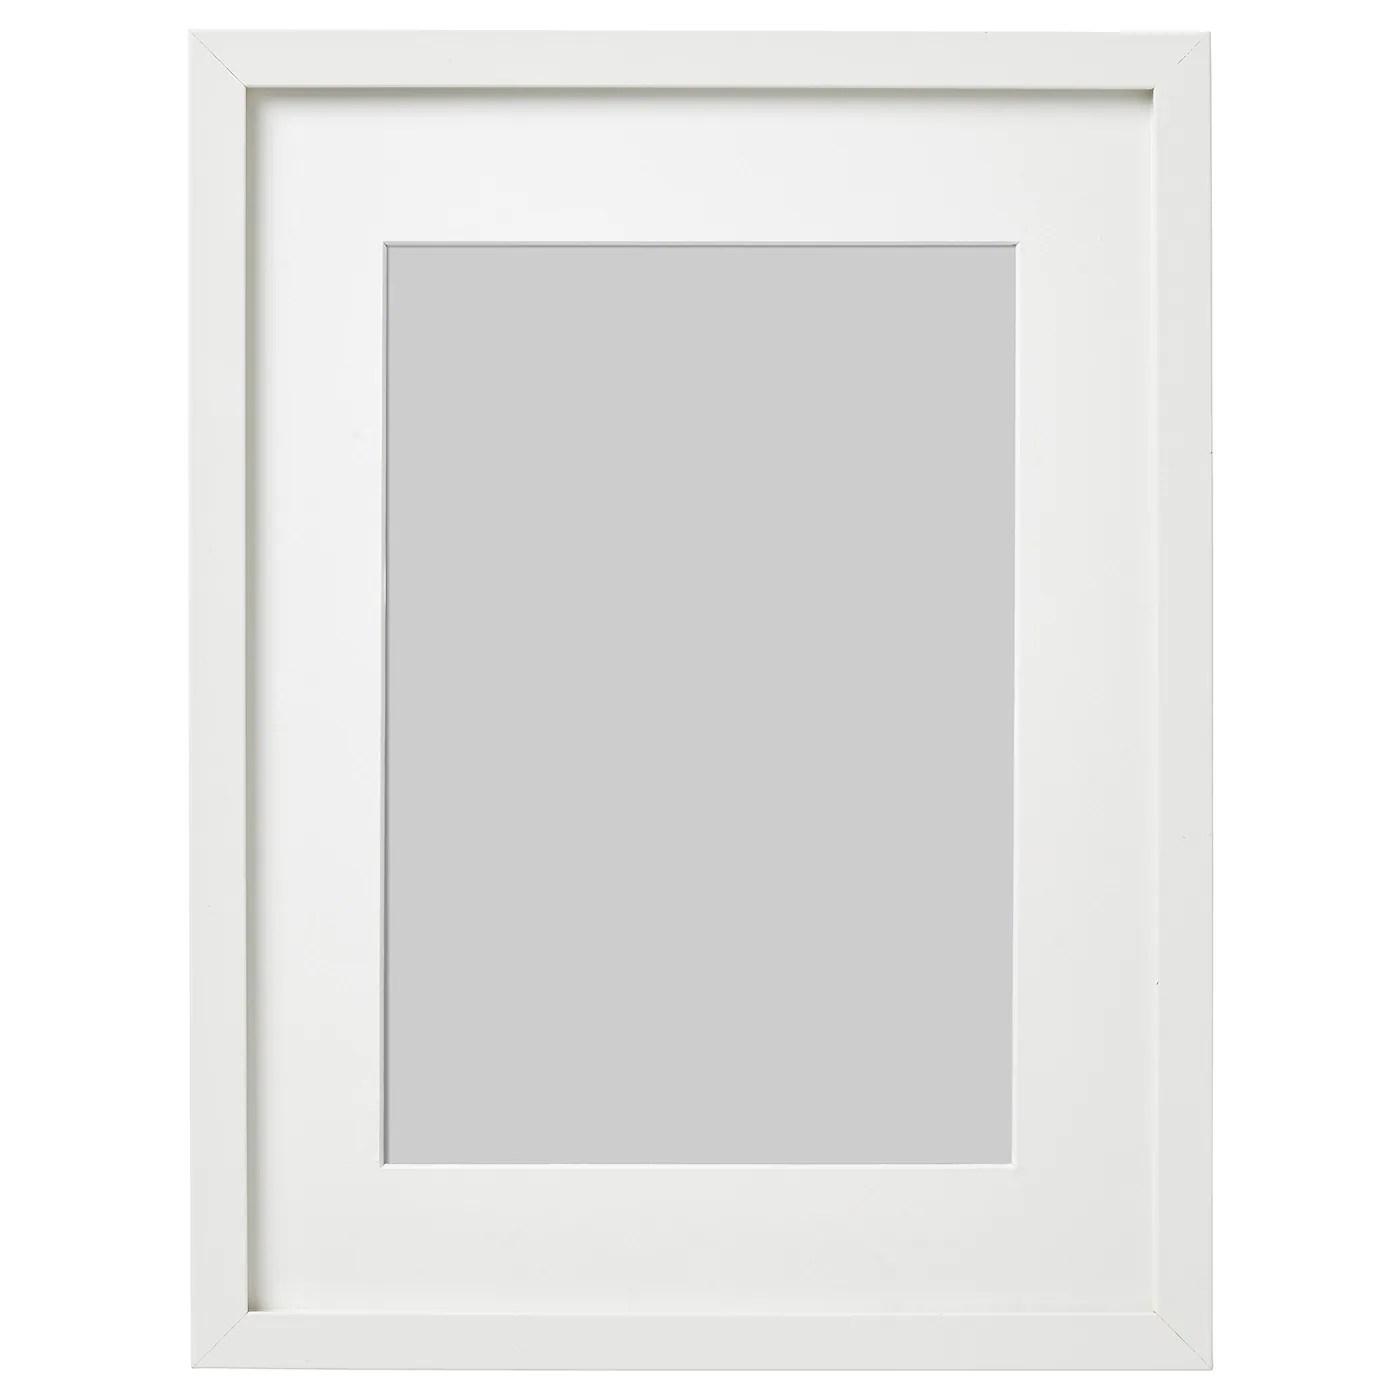 ribba frame white 30x40 cm